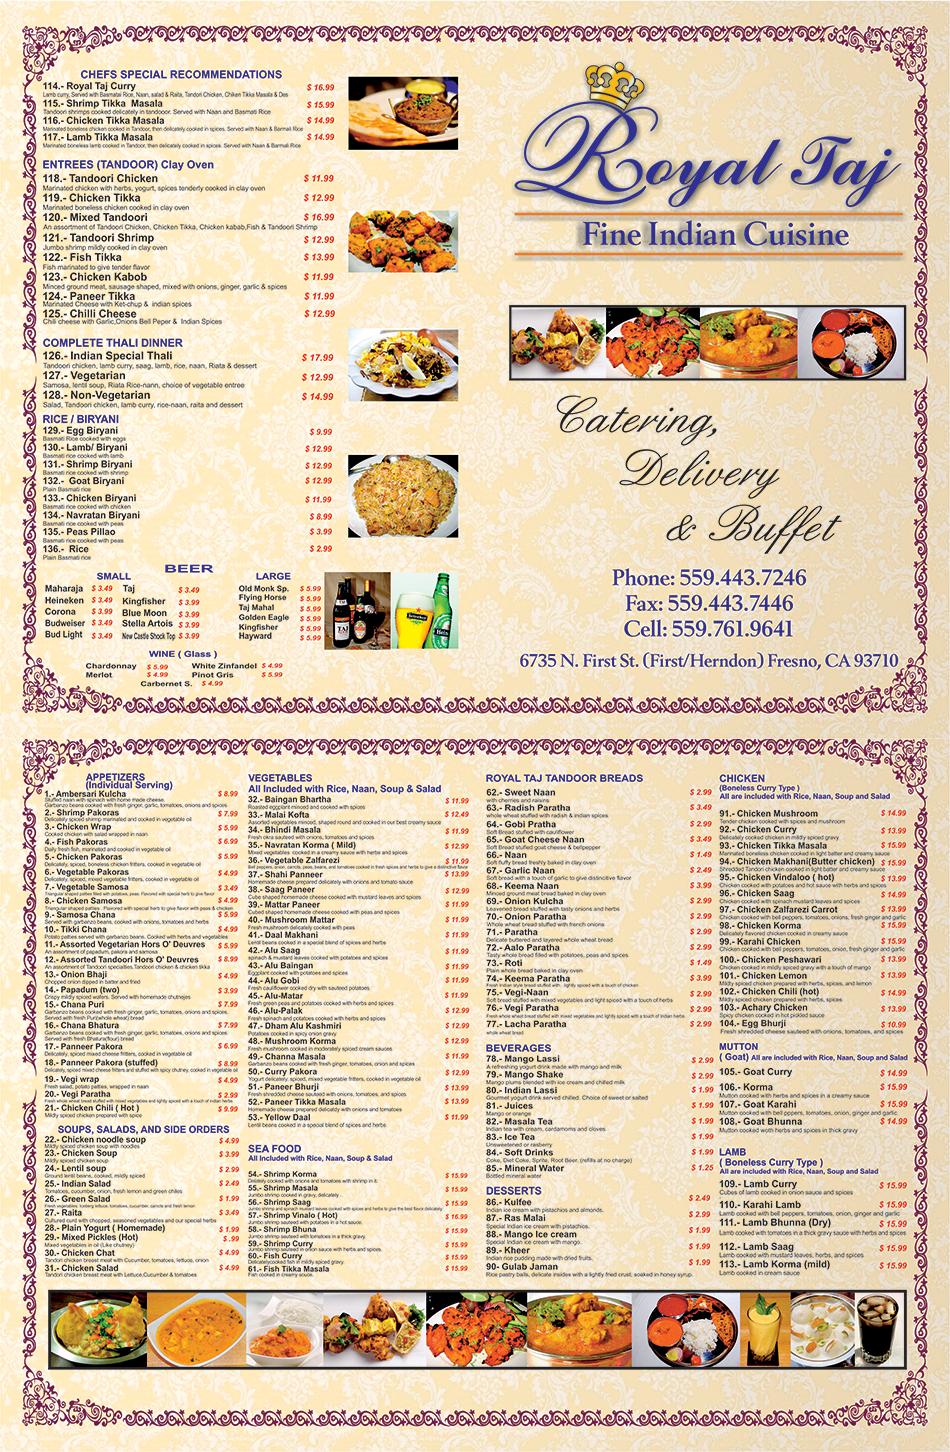 Royal Taj Fine Indian Cuisine - Menu